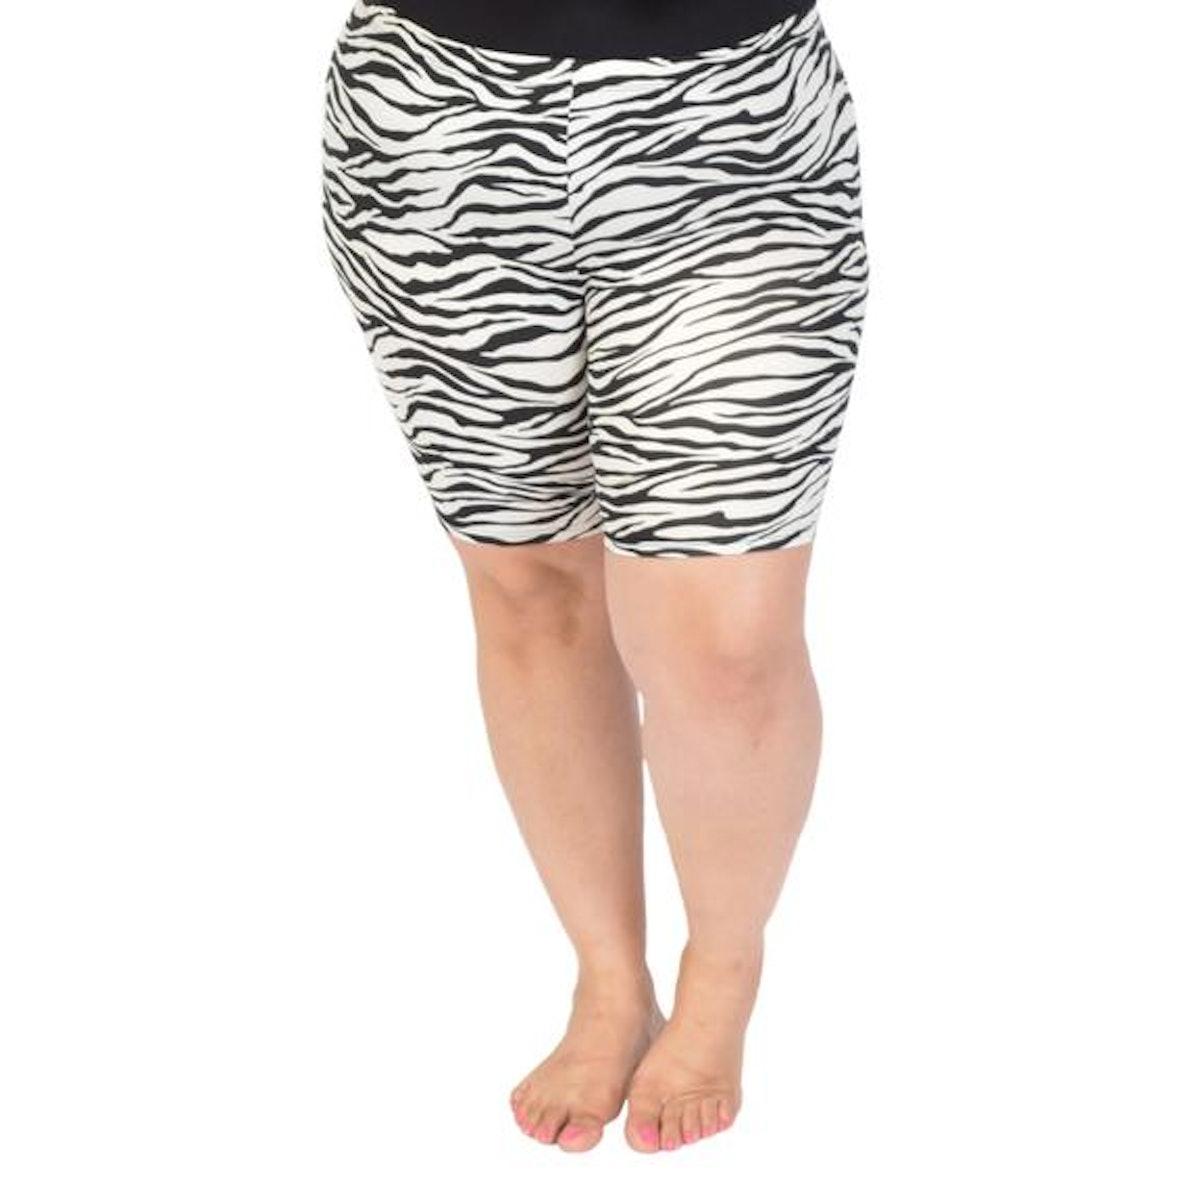 Women's Plus Size Stretch Print Bike Shorts in Zebra